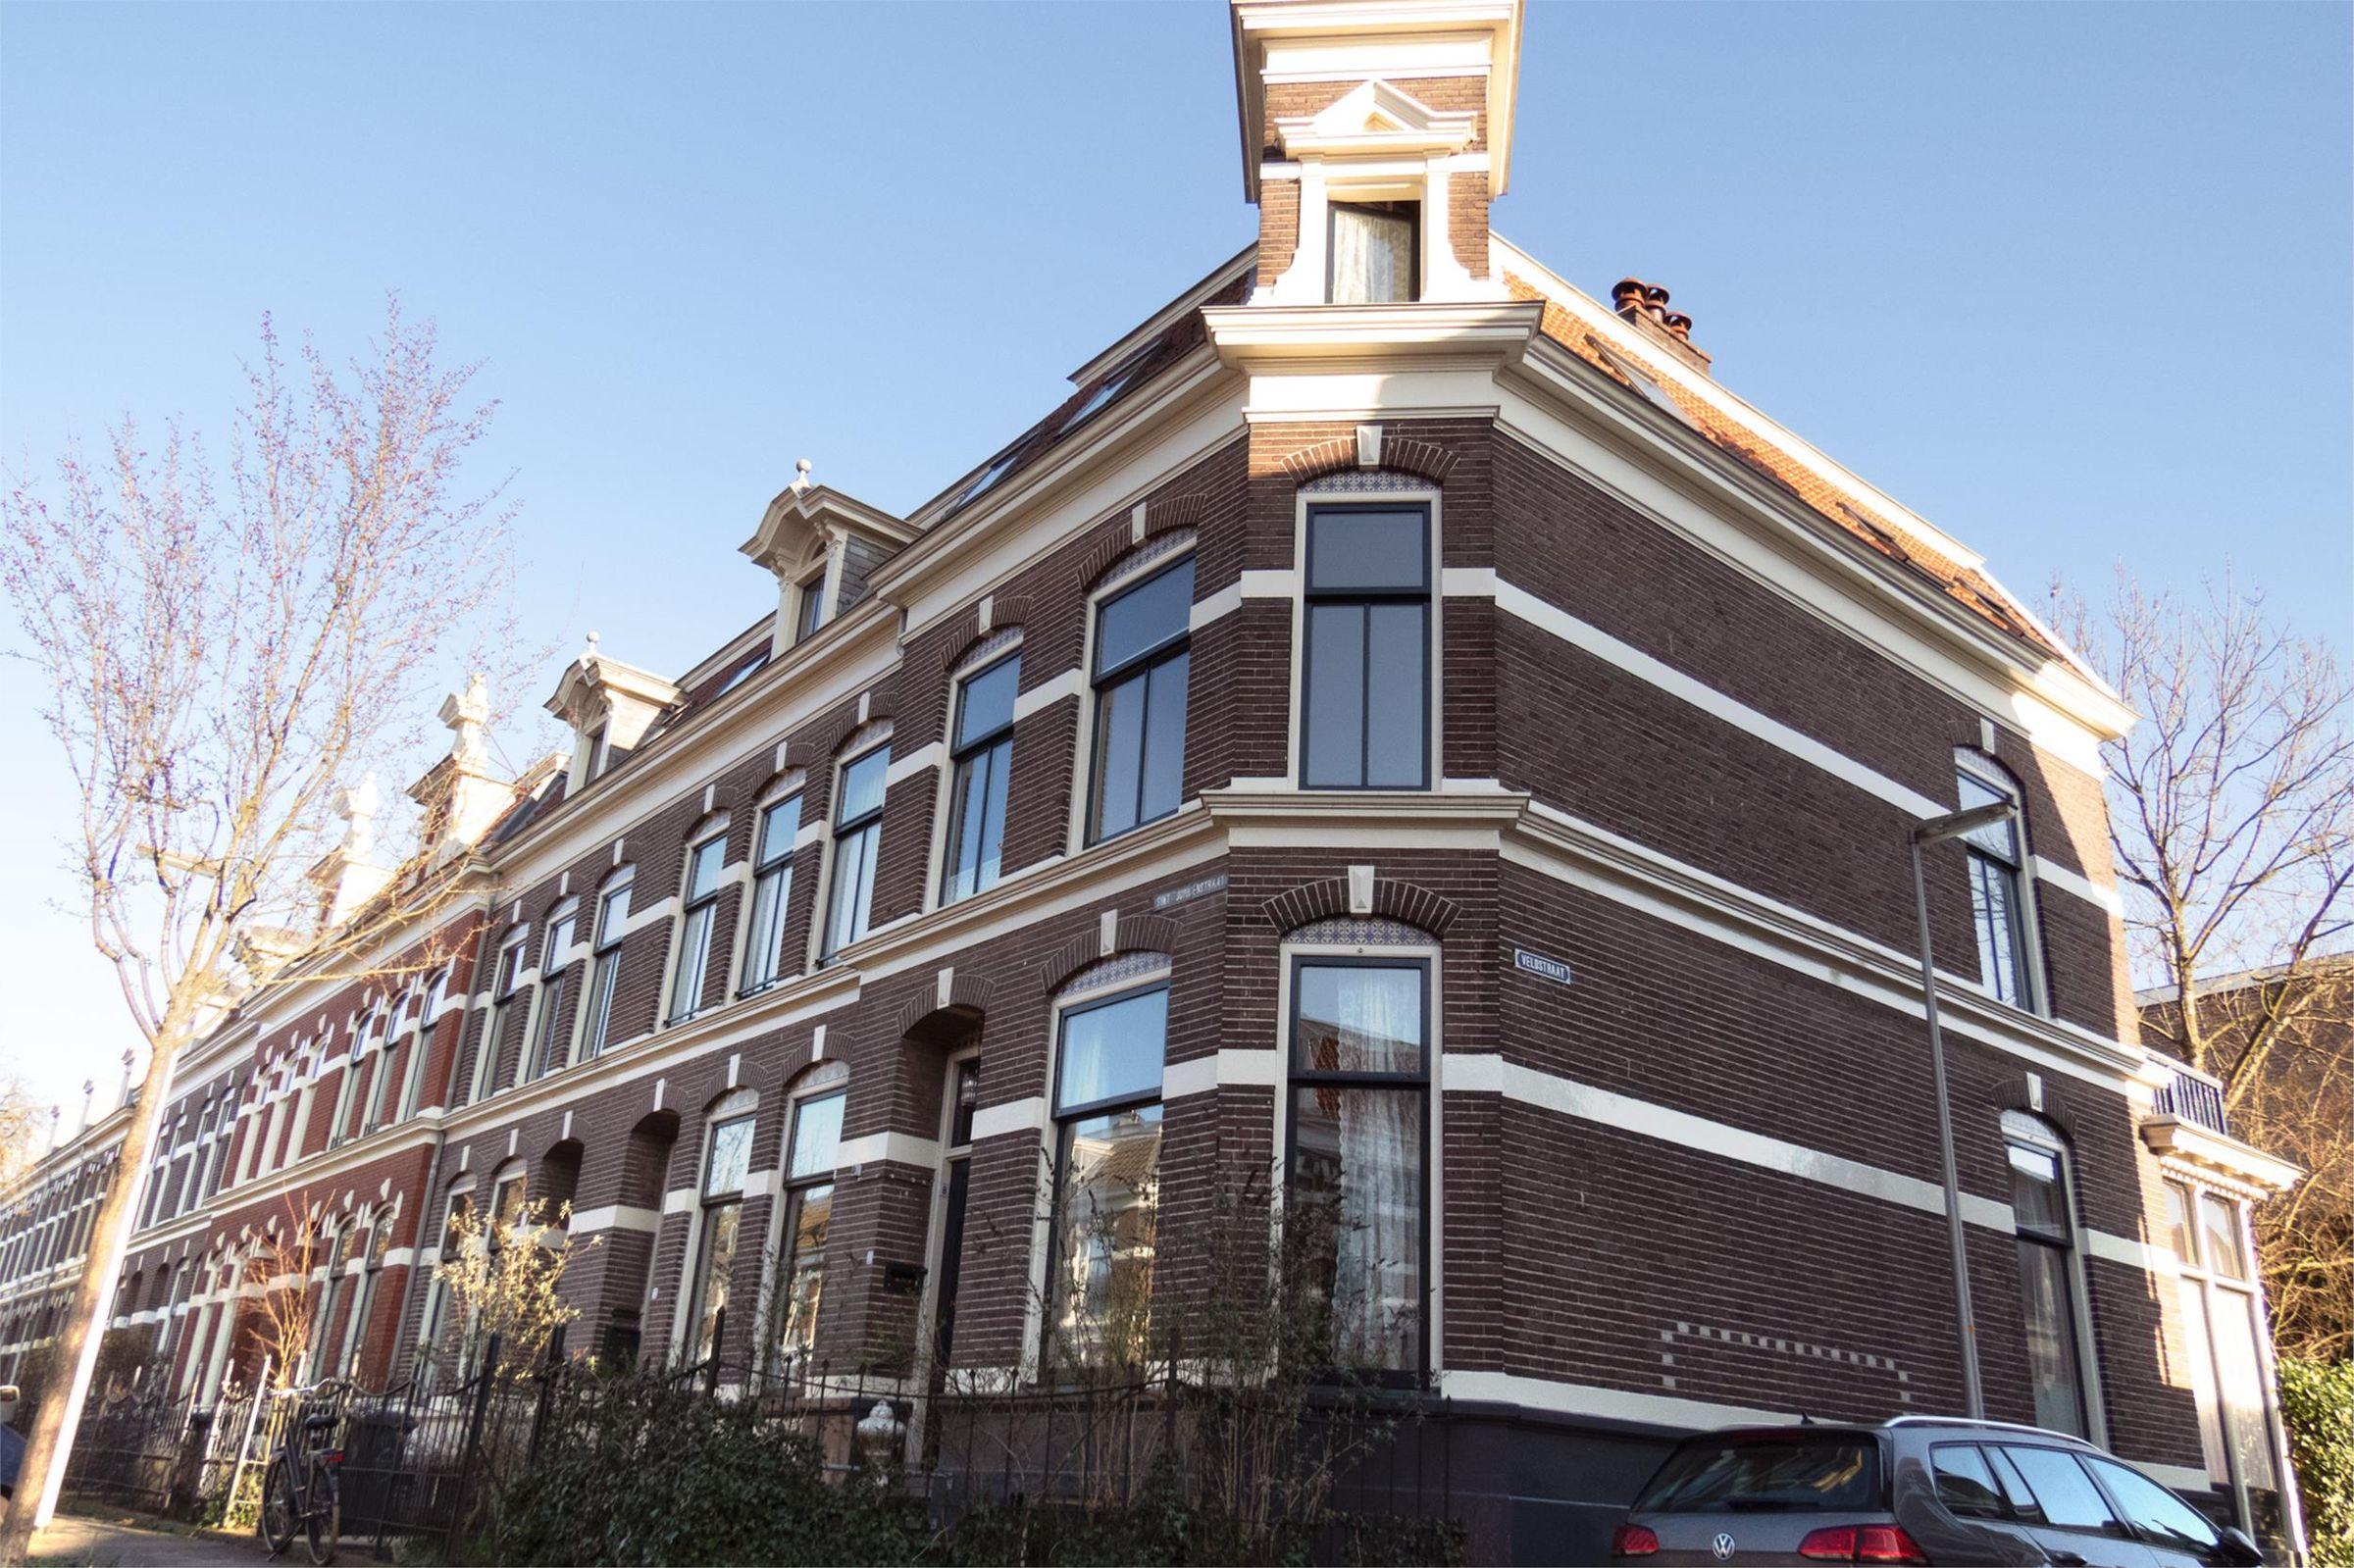 Sint Jurrienstraat 8, Deventer